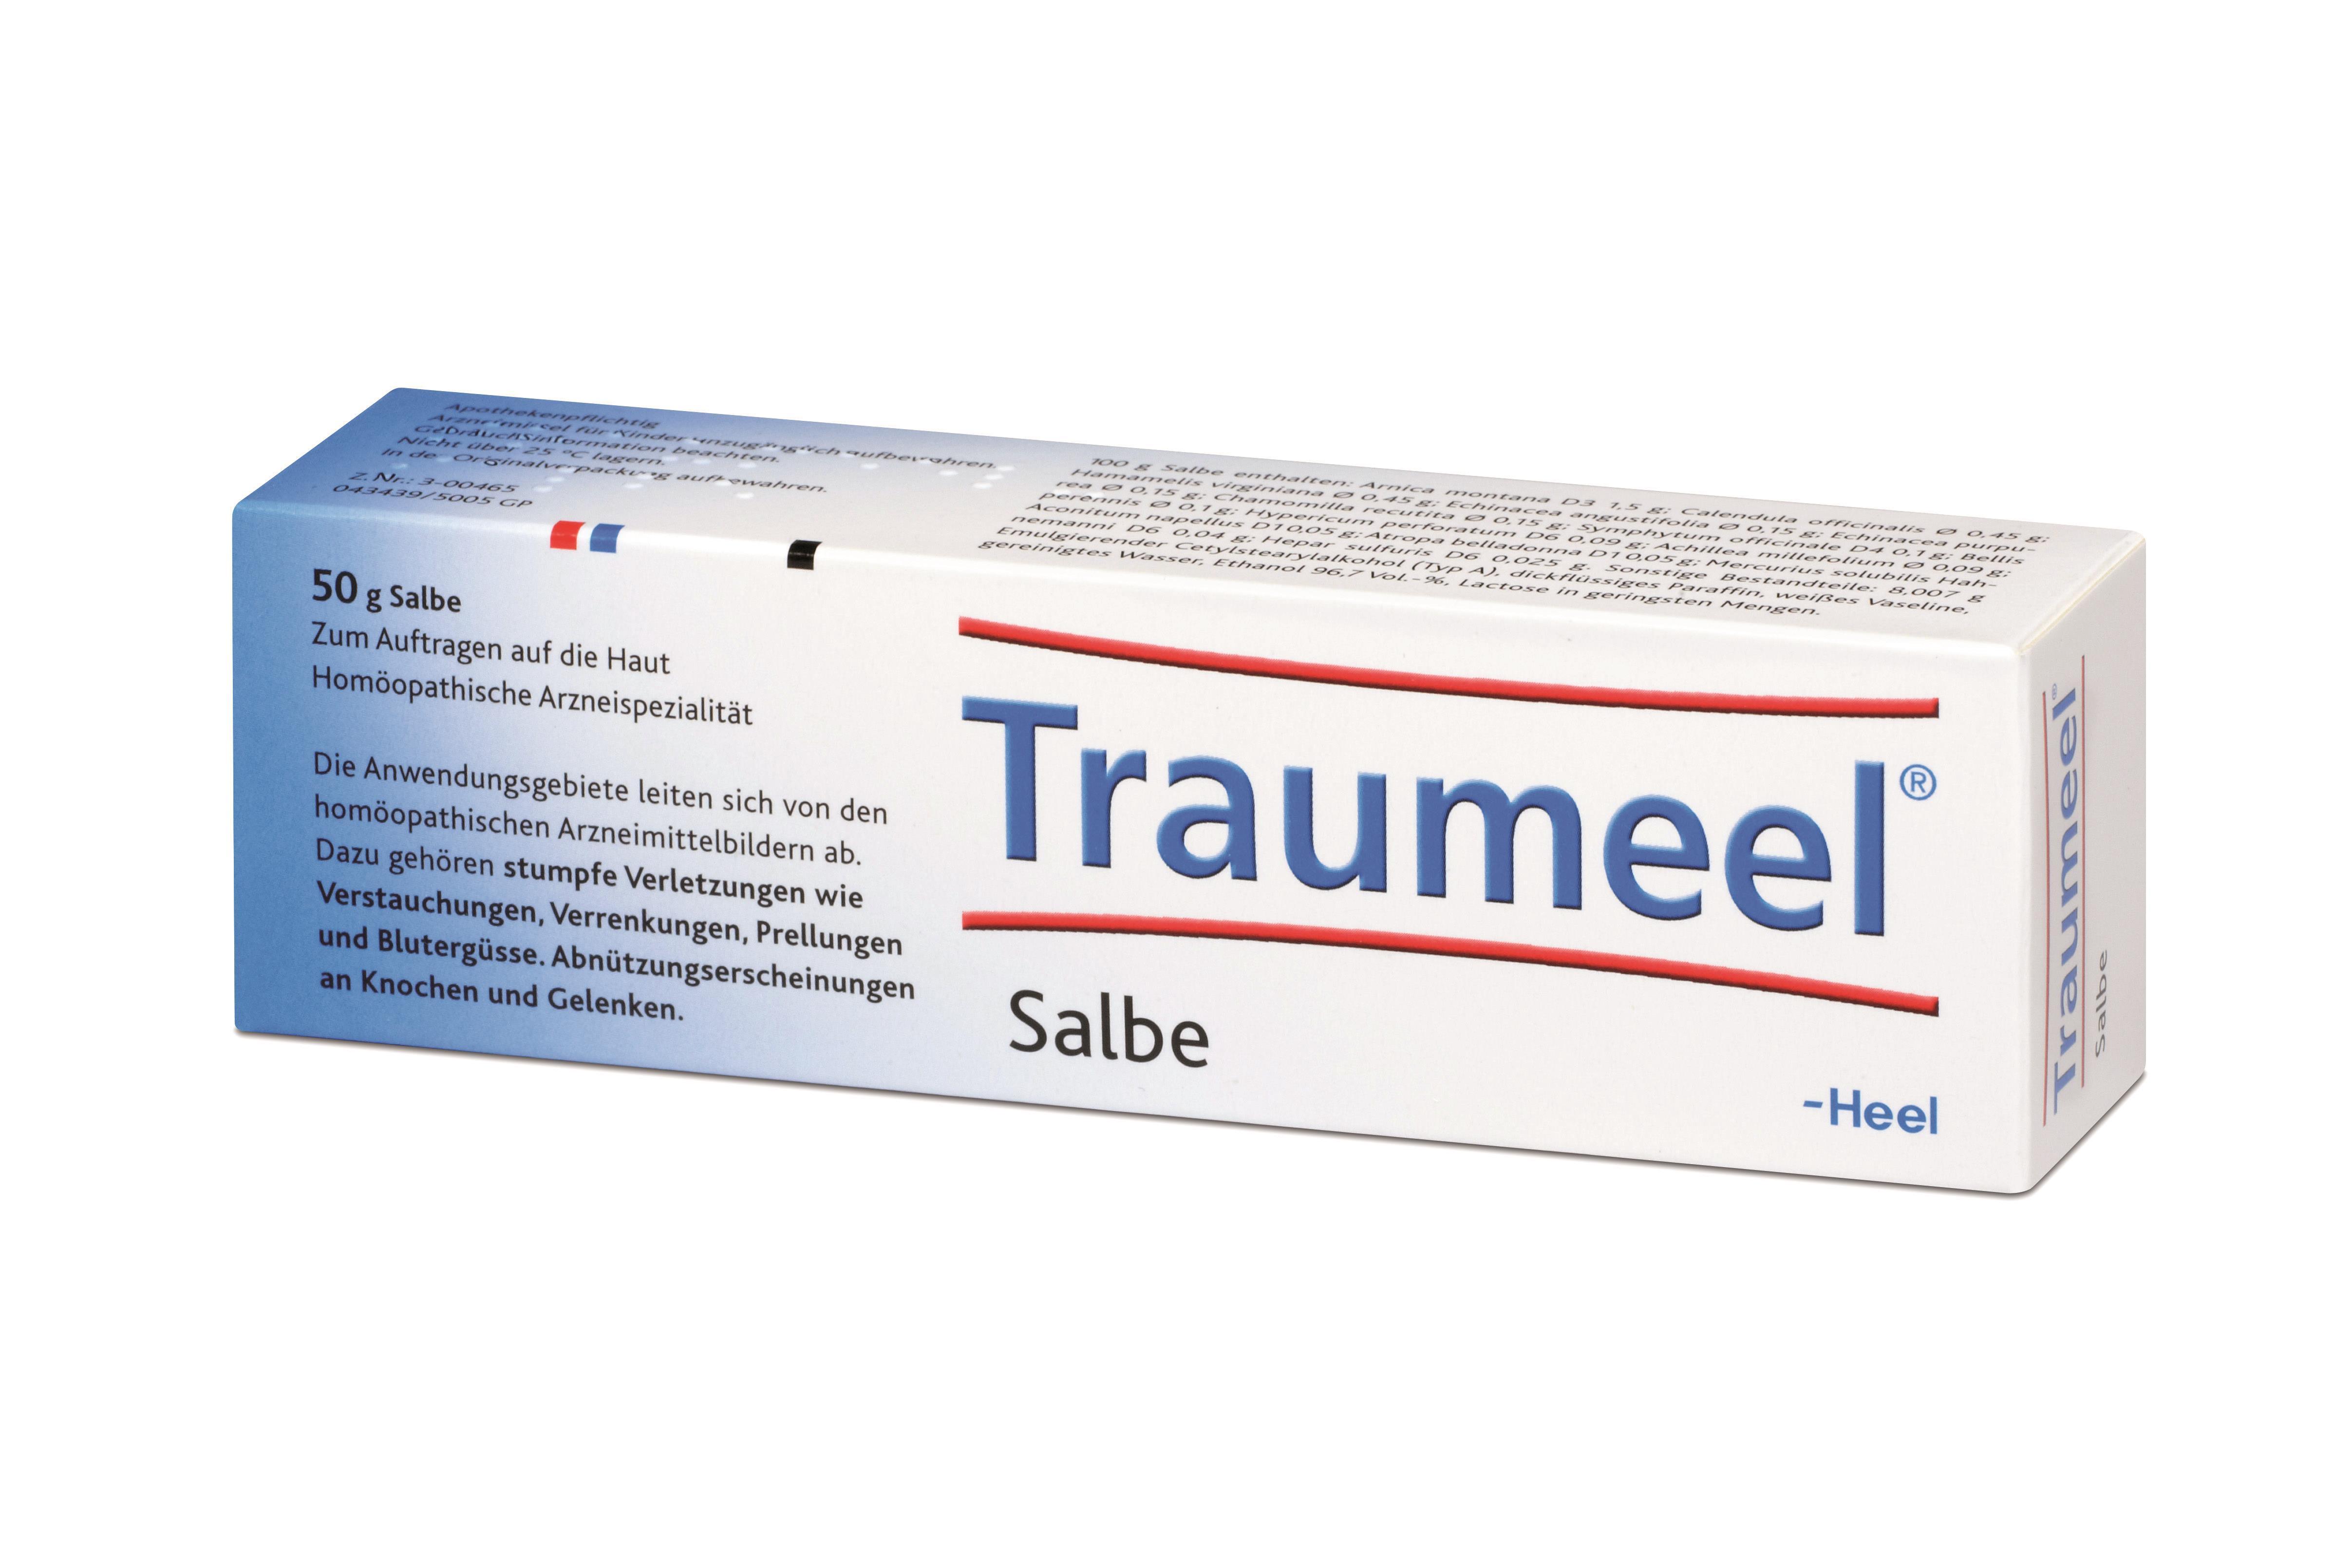 Traumeel - Salbe